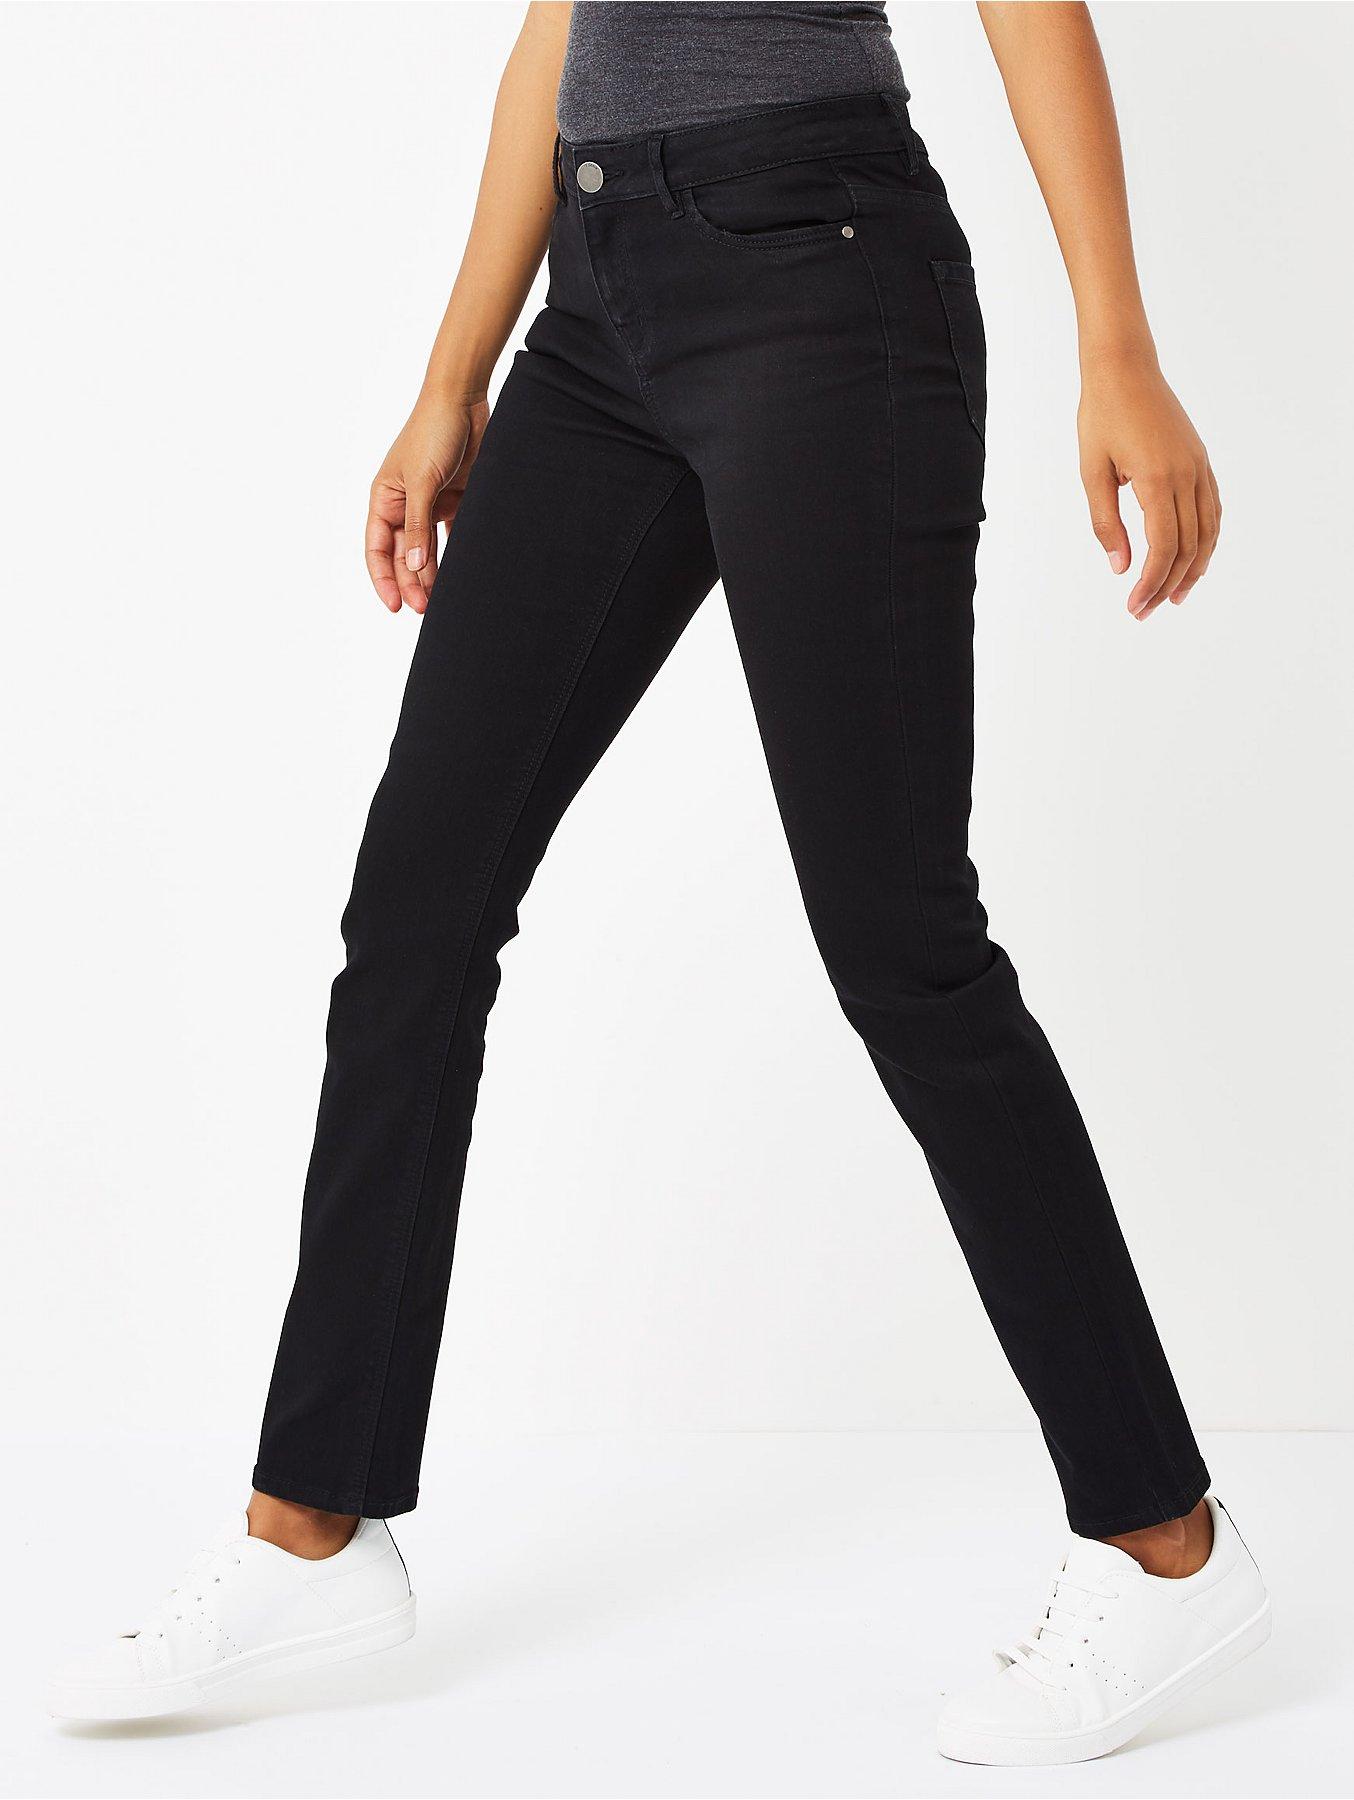 839d3f6b486 Black Straight Leg Jeans. Reset